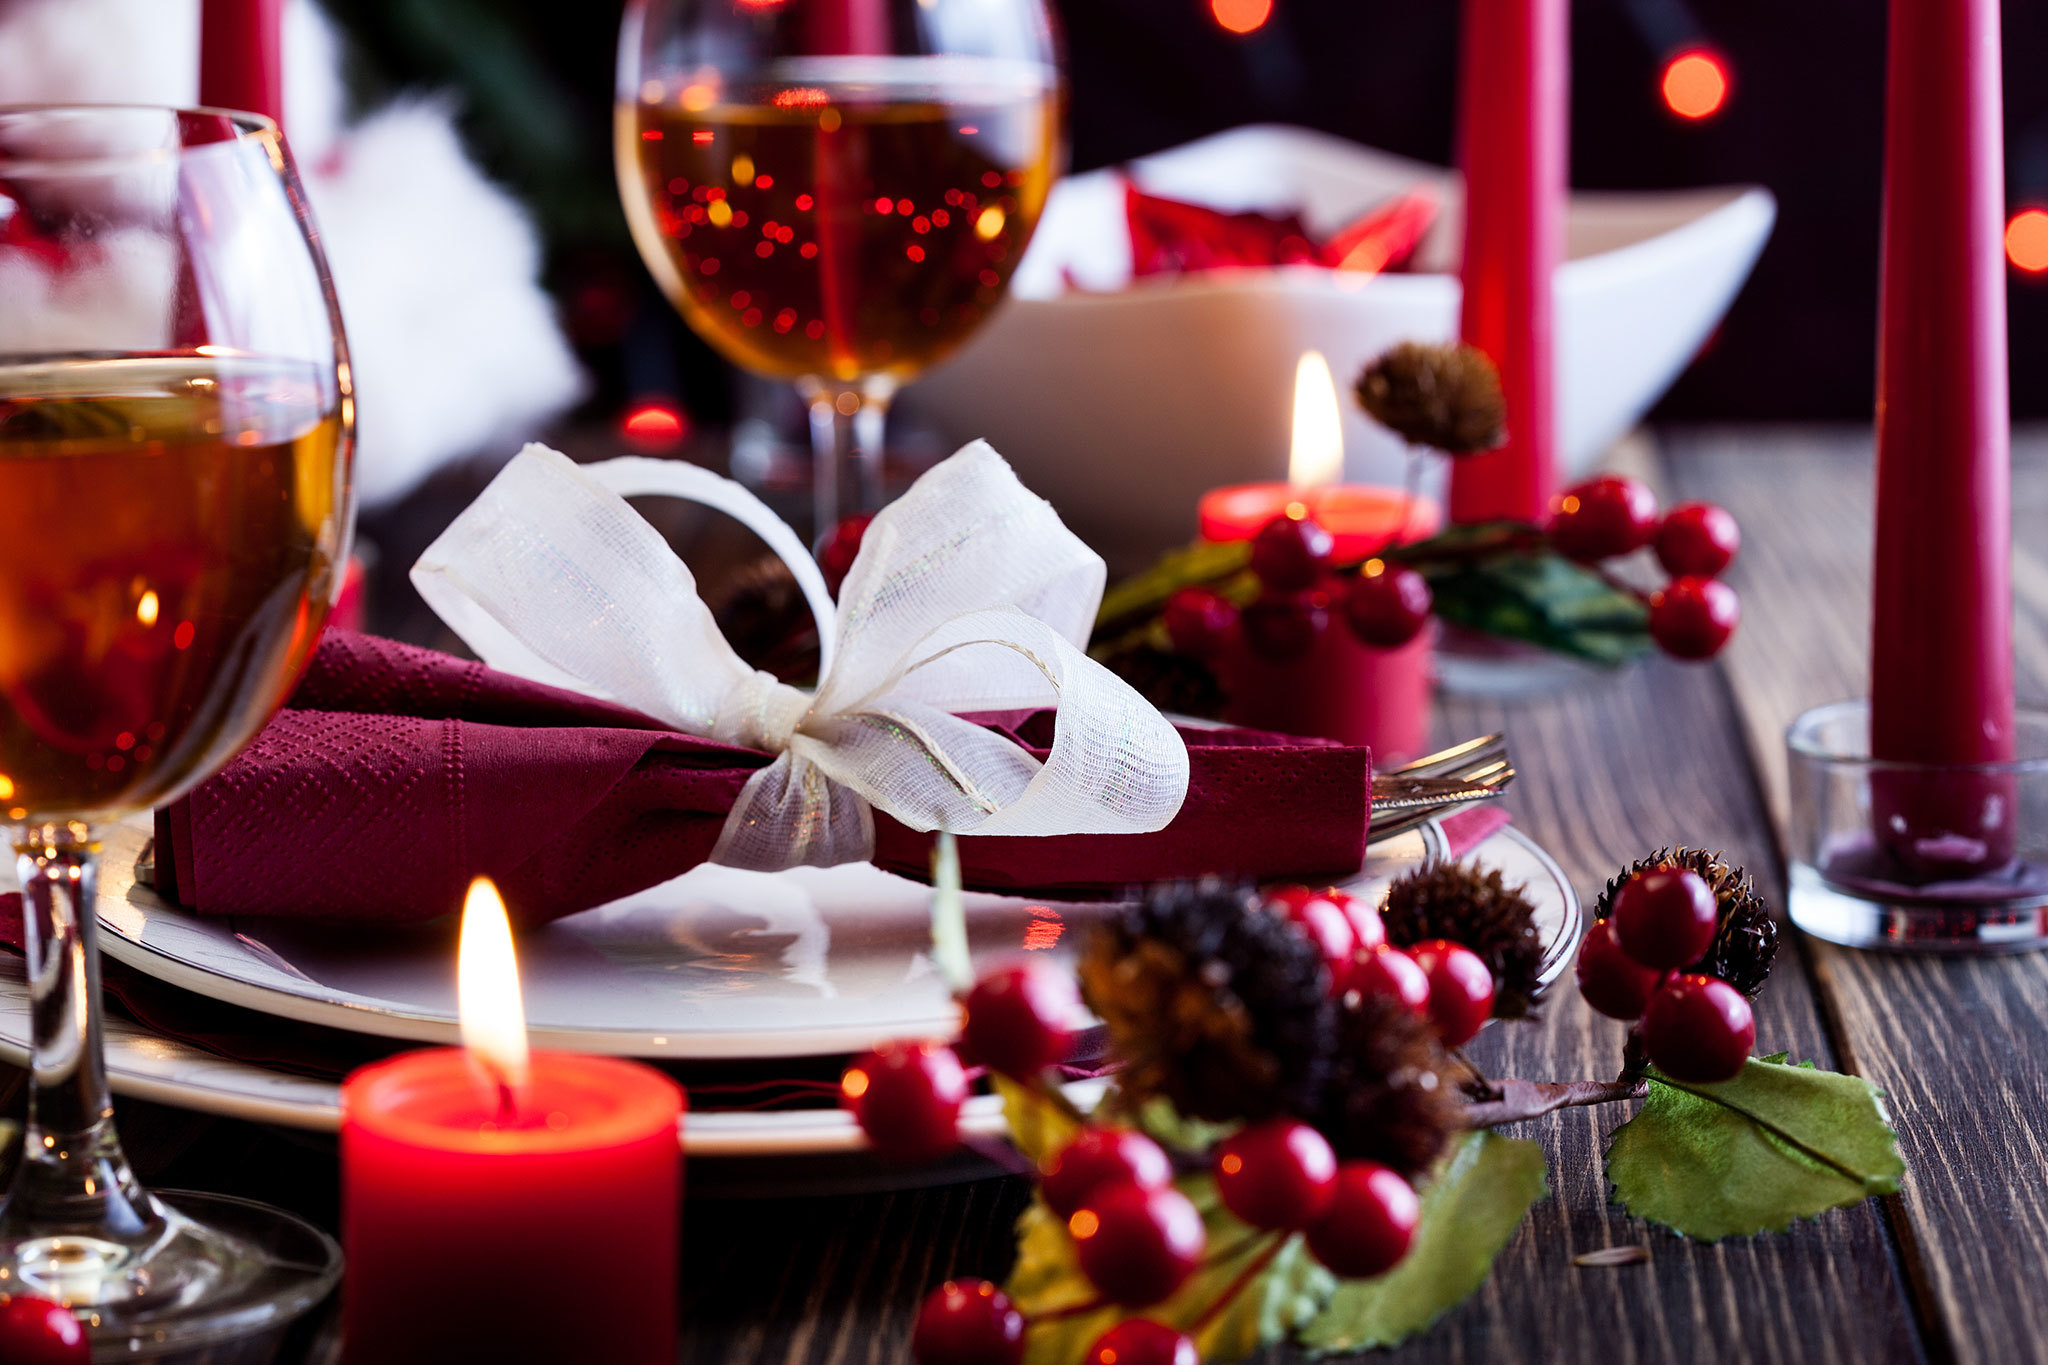 San Francisco restaurants open on Christmas Day and Christmas Eve